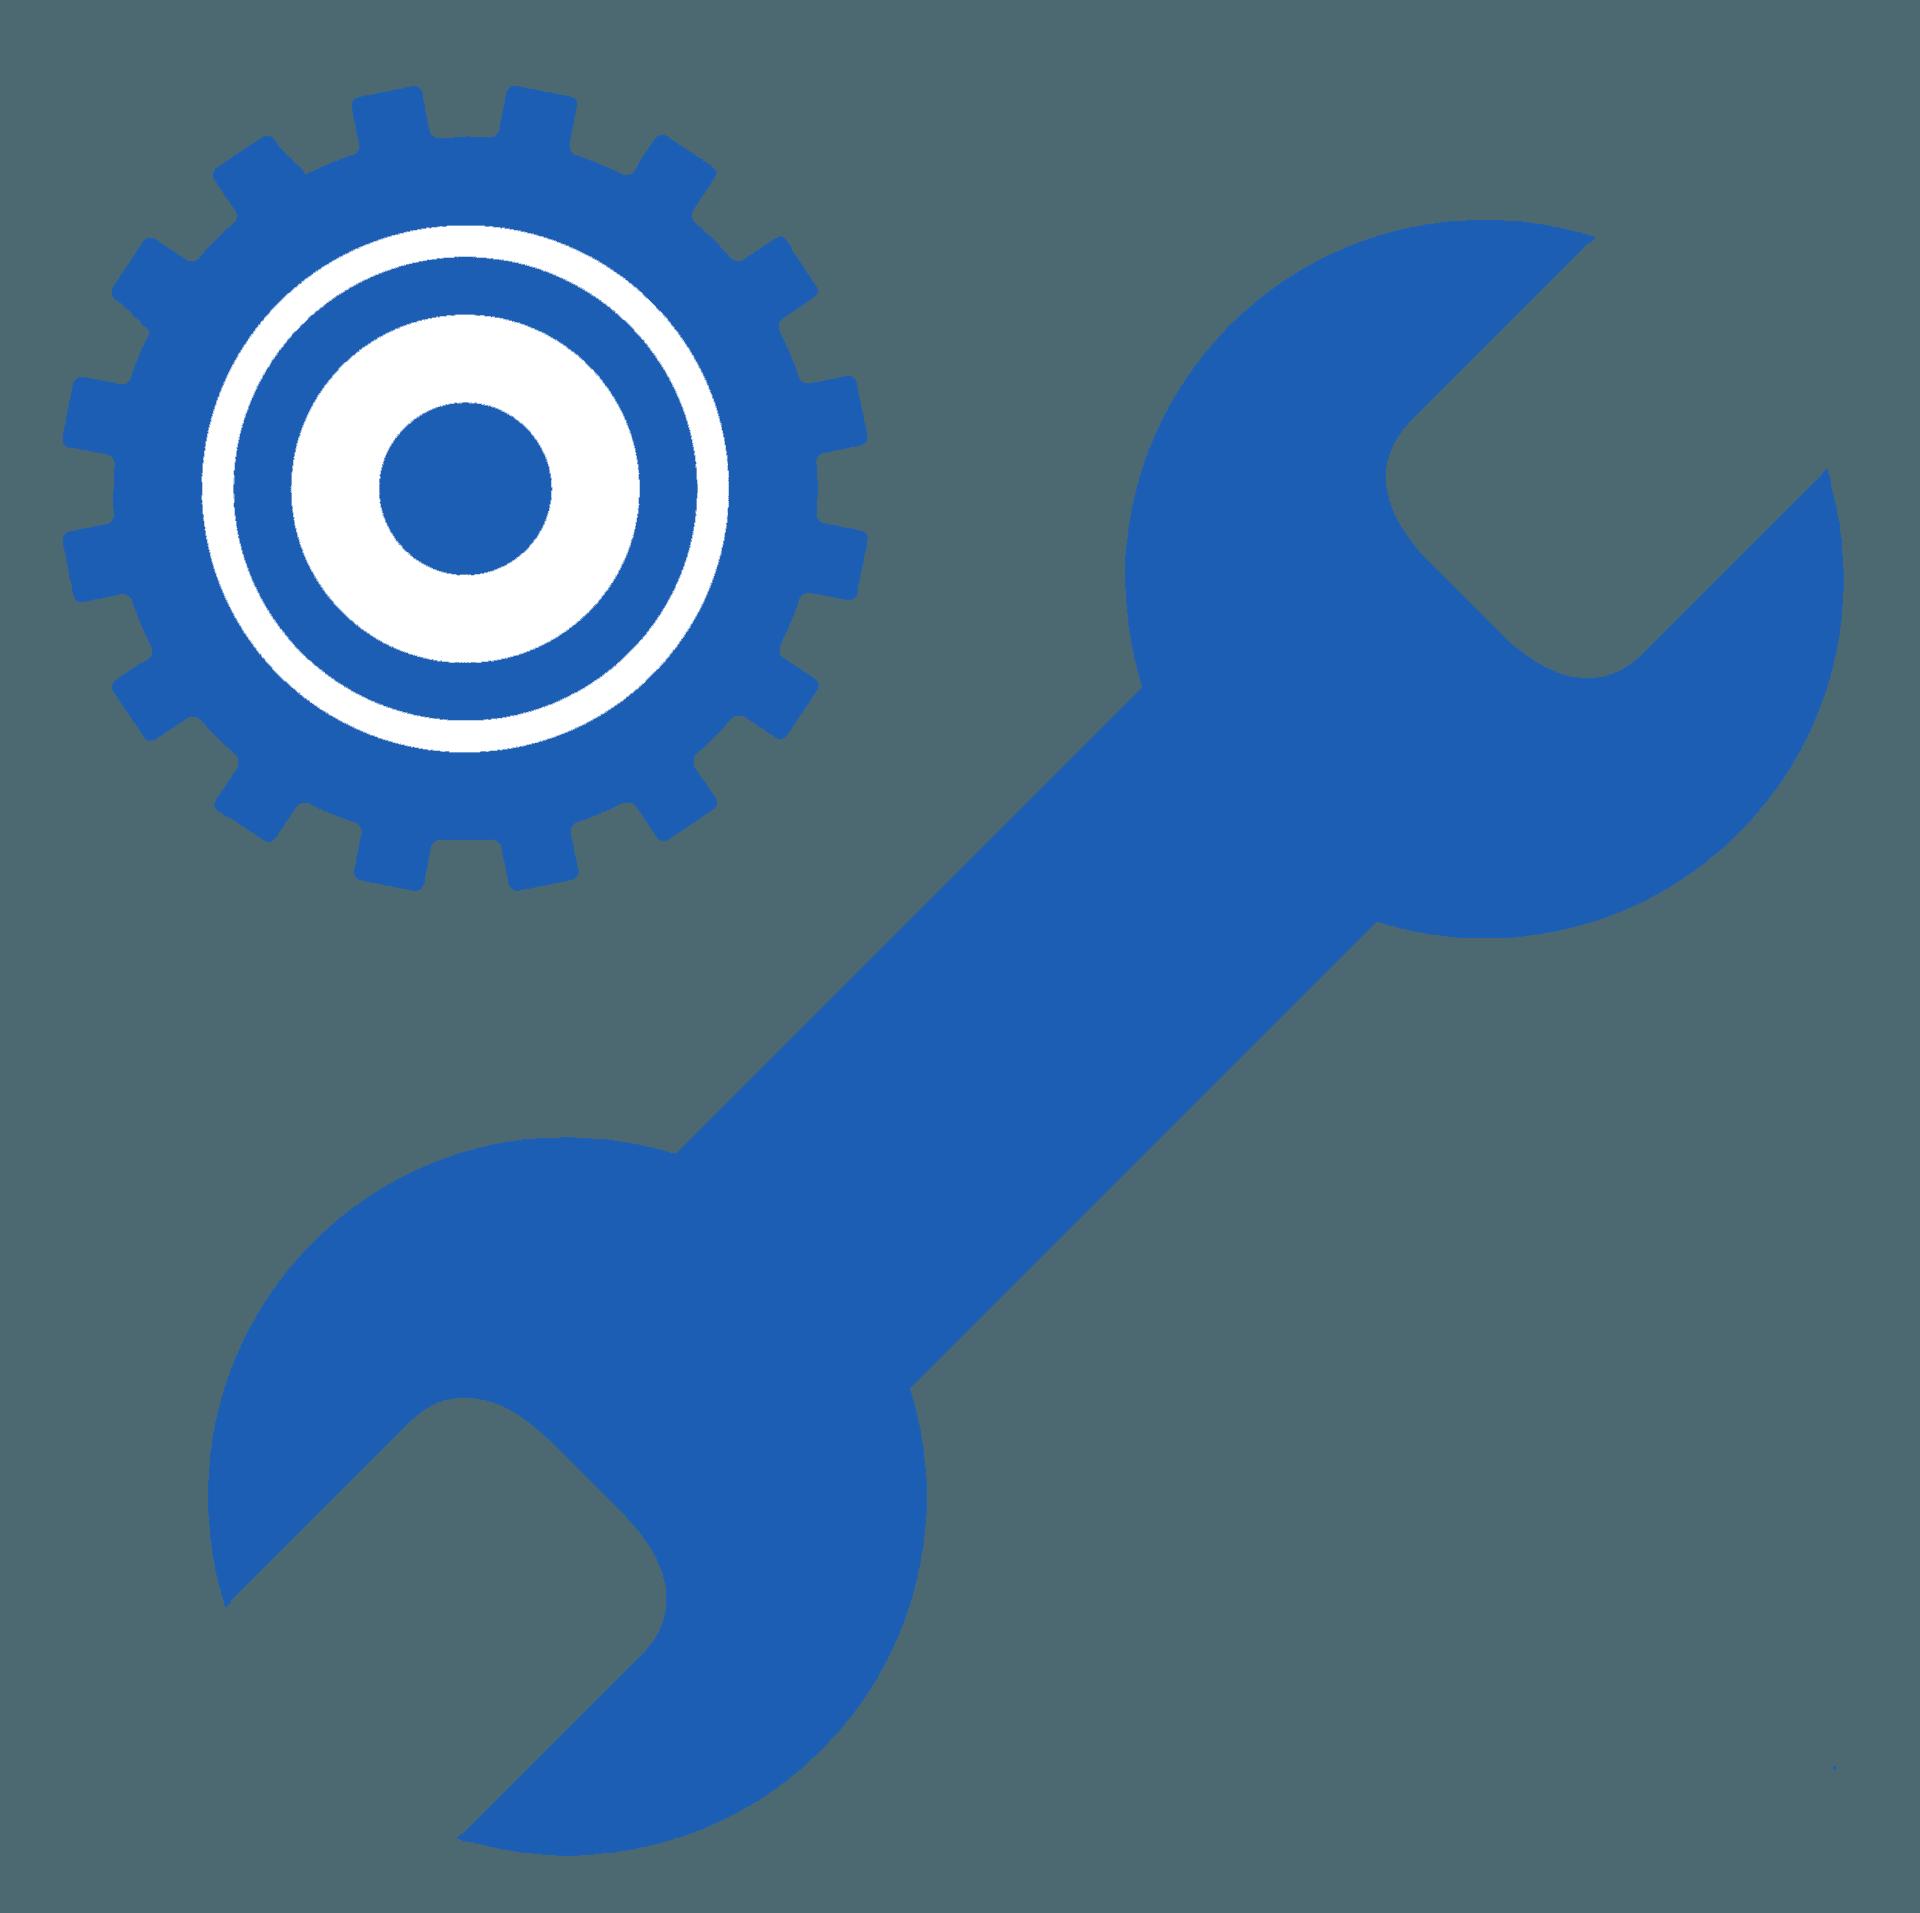 icona chiave inglese e ingranaggio